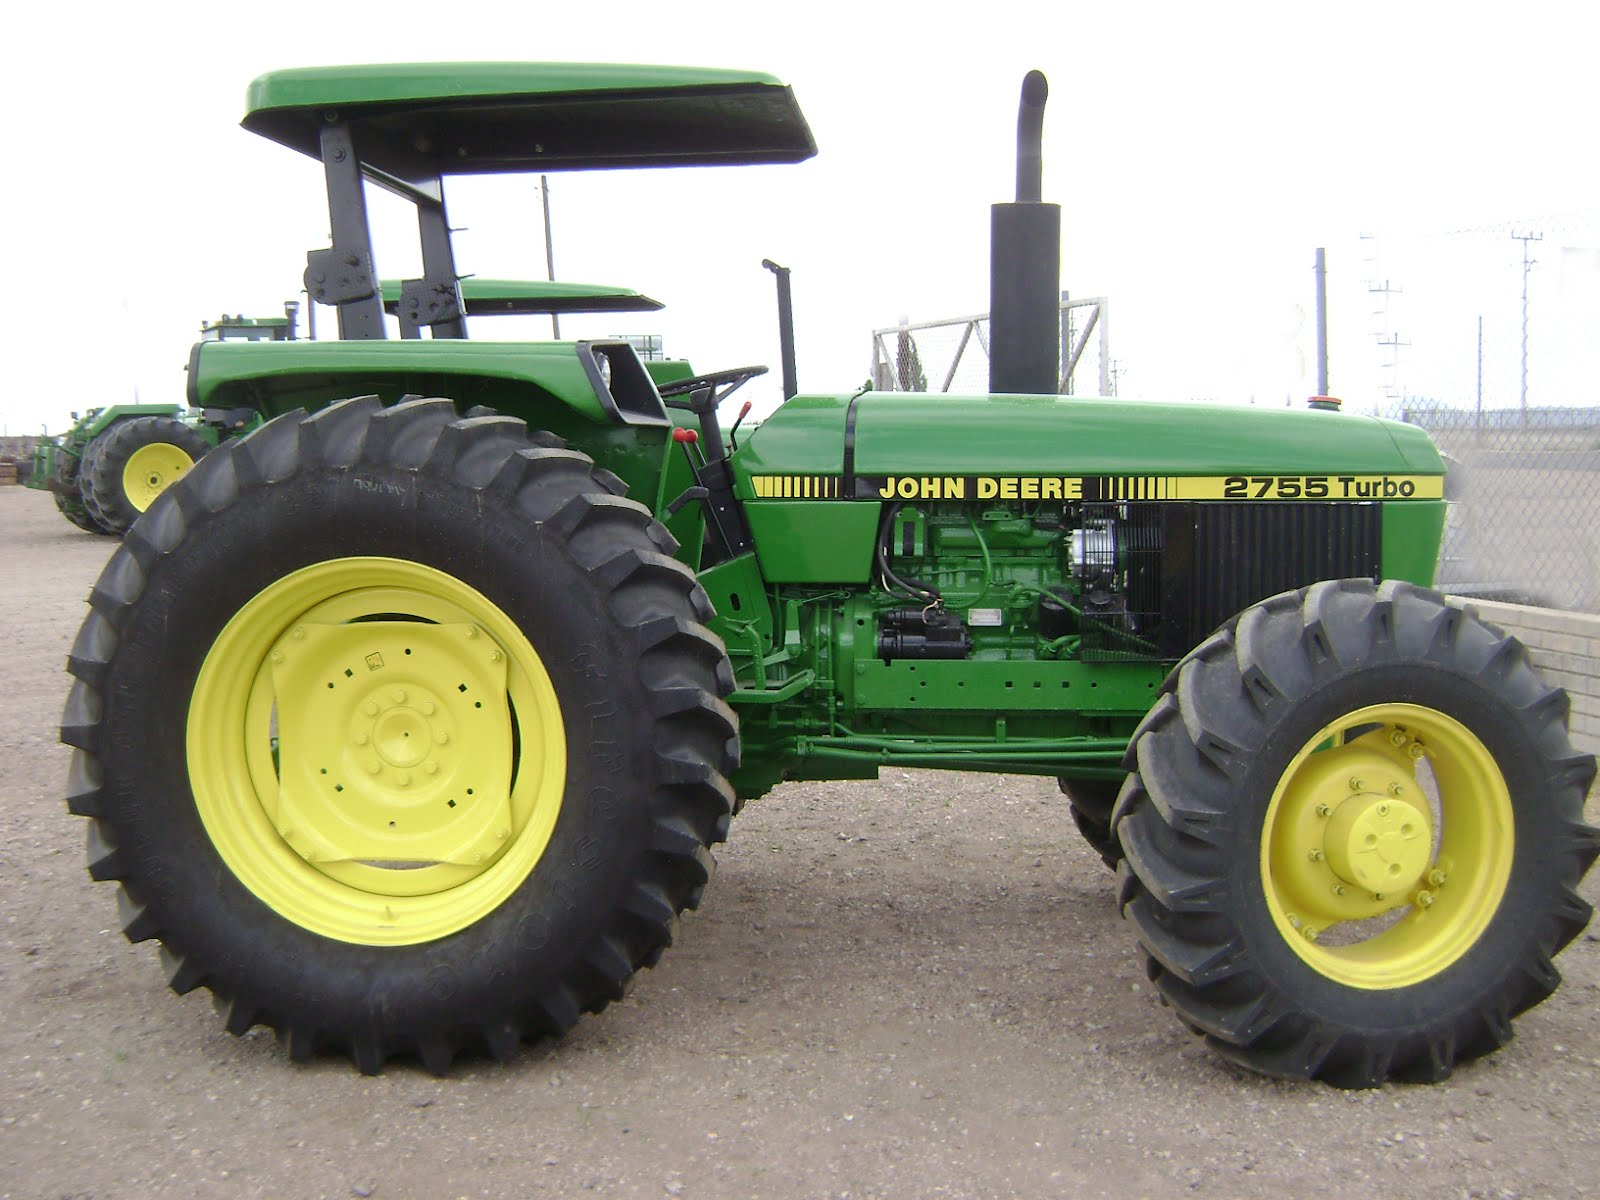 Maquinaria Agricola Industrial  Tractor John Deere 2755 4x4  19 000 Dlls